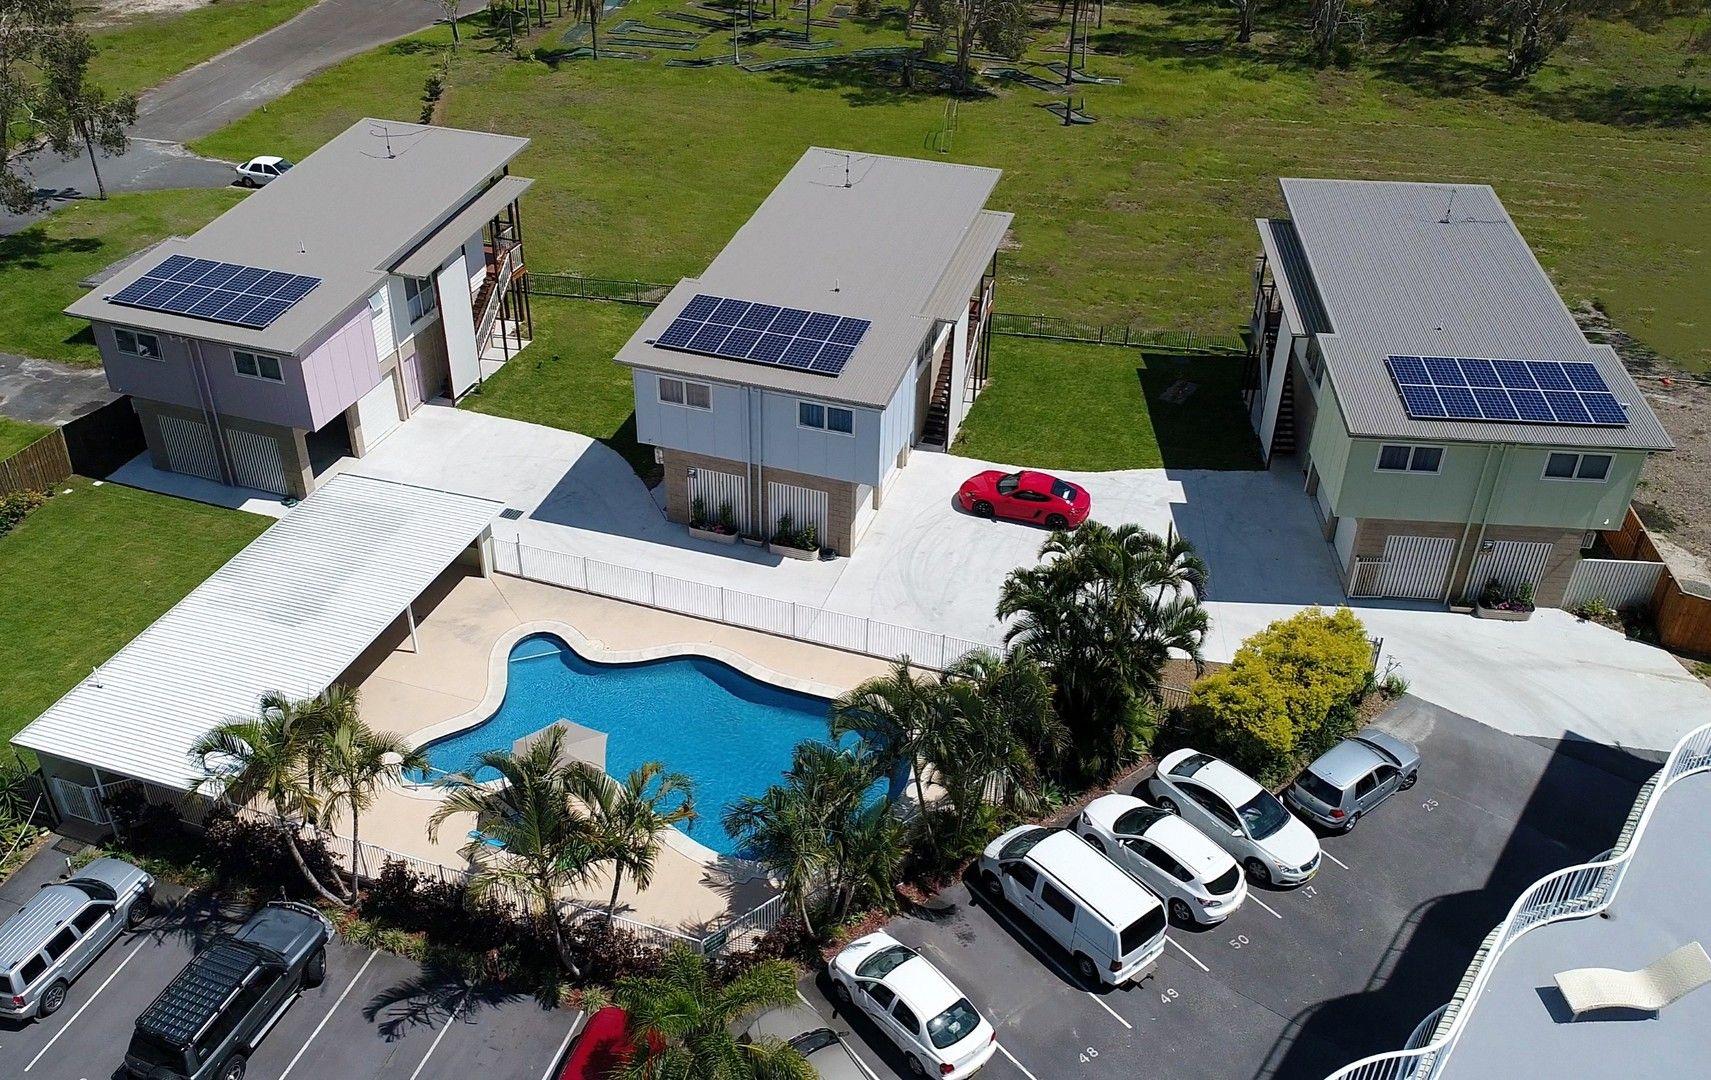 54/77 Tamarind Avenu Tamarind Ave, Bogangar NSW 2488, Image 1